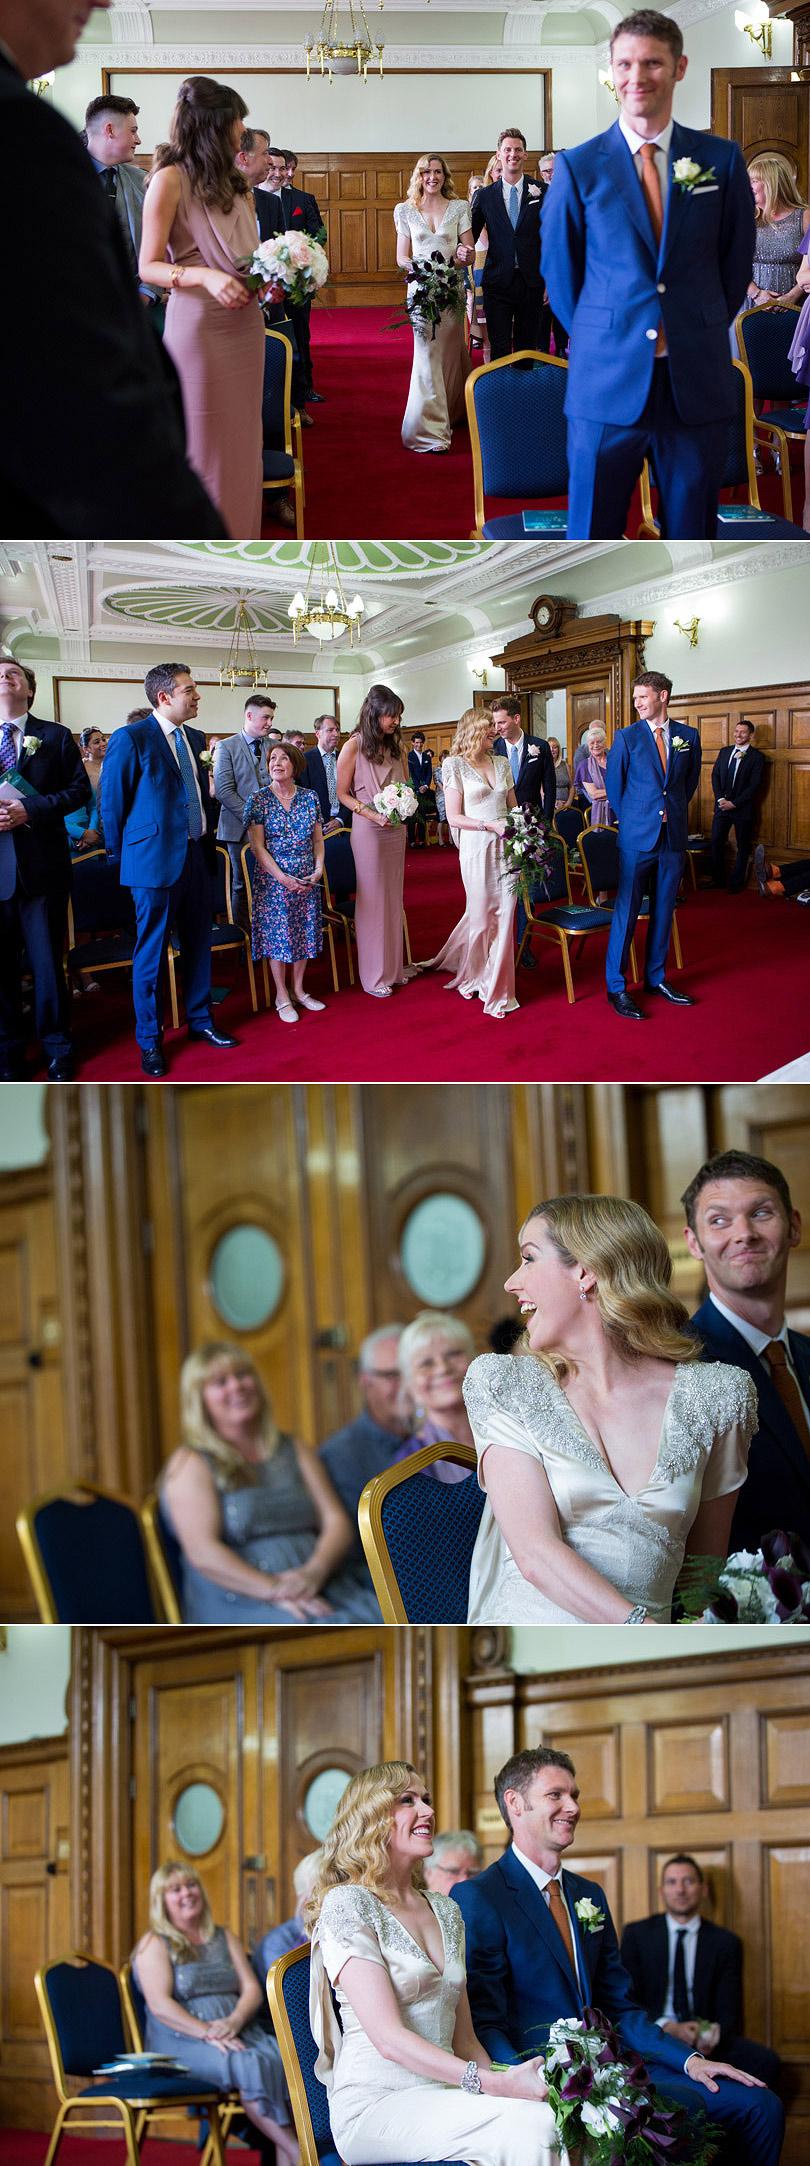 Islington-Town-Hall-Wedding-Jugged-Hare-Reception-06.jpg